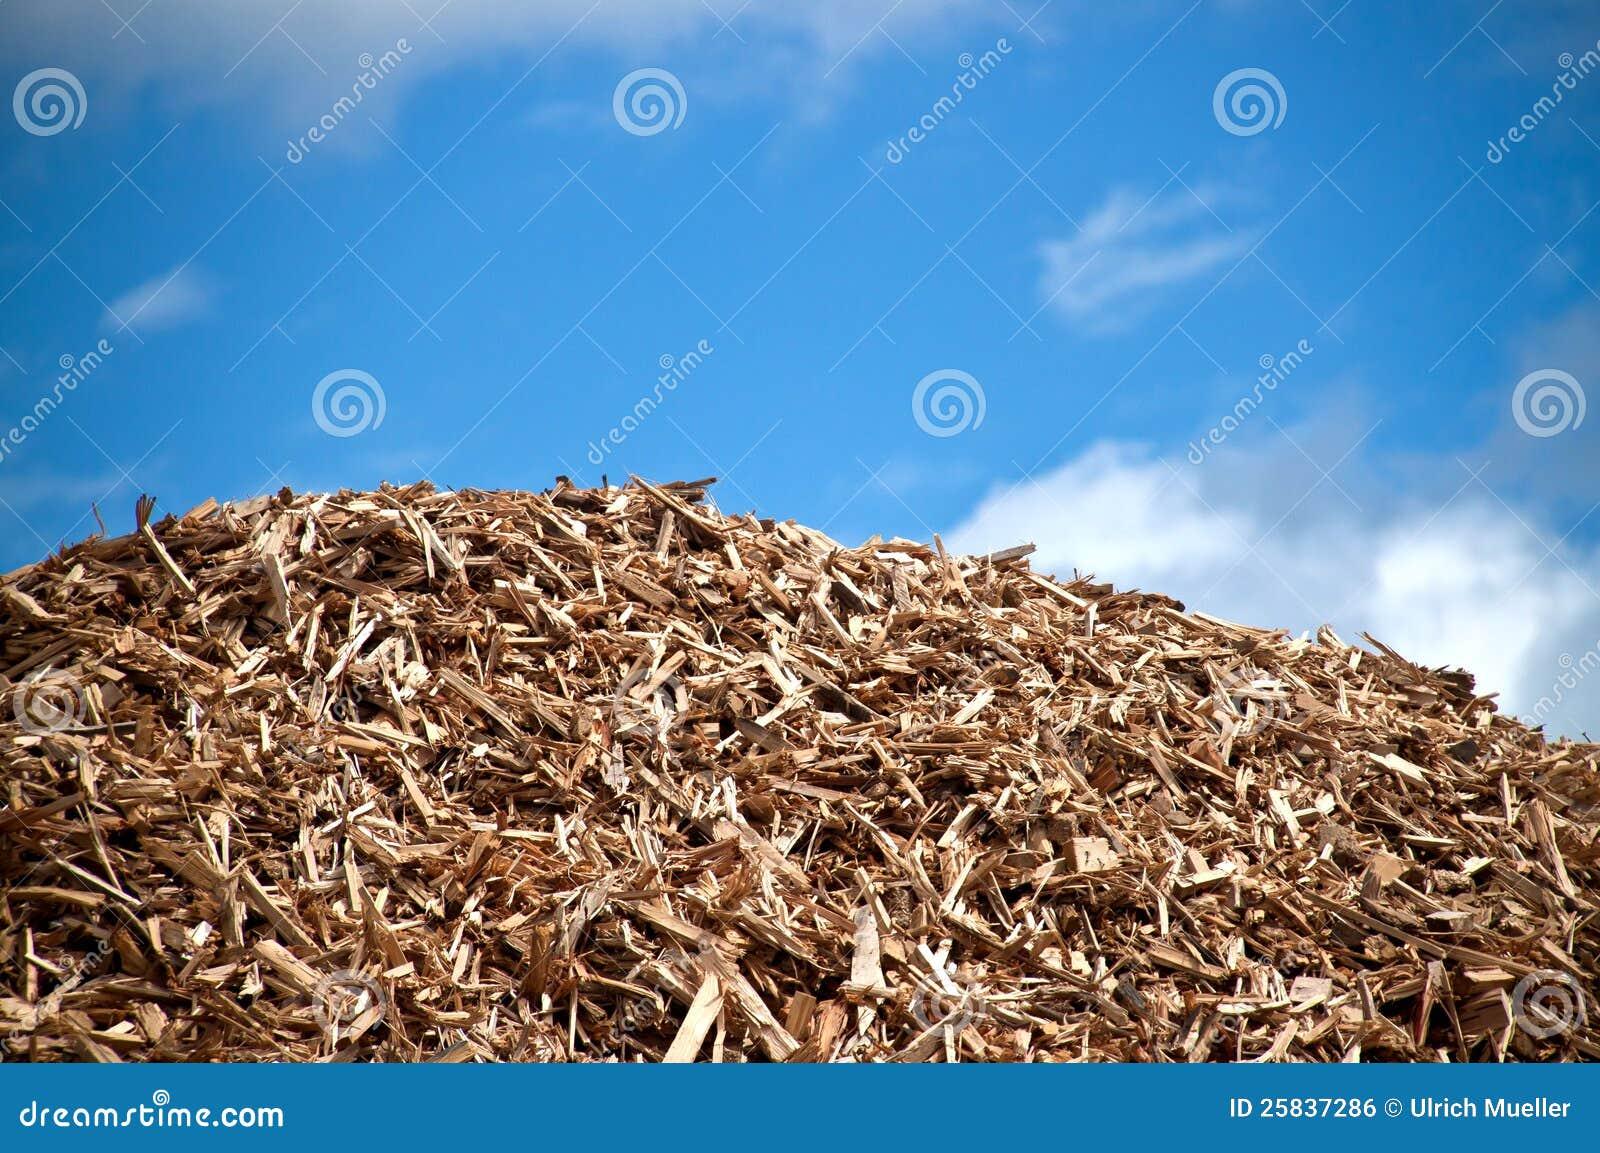 Pile of biomass